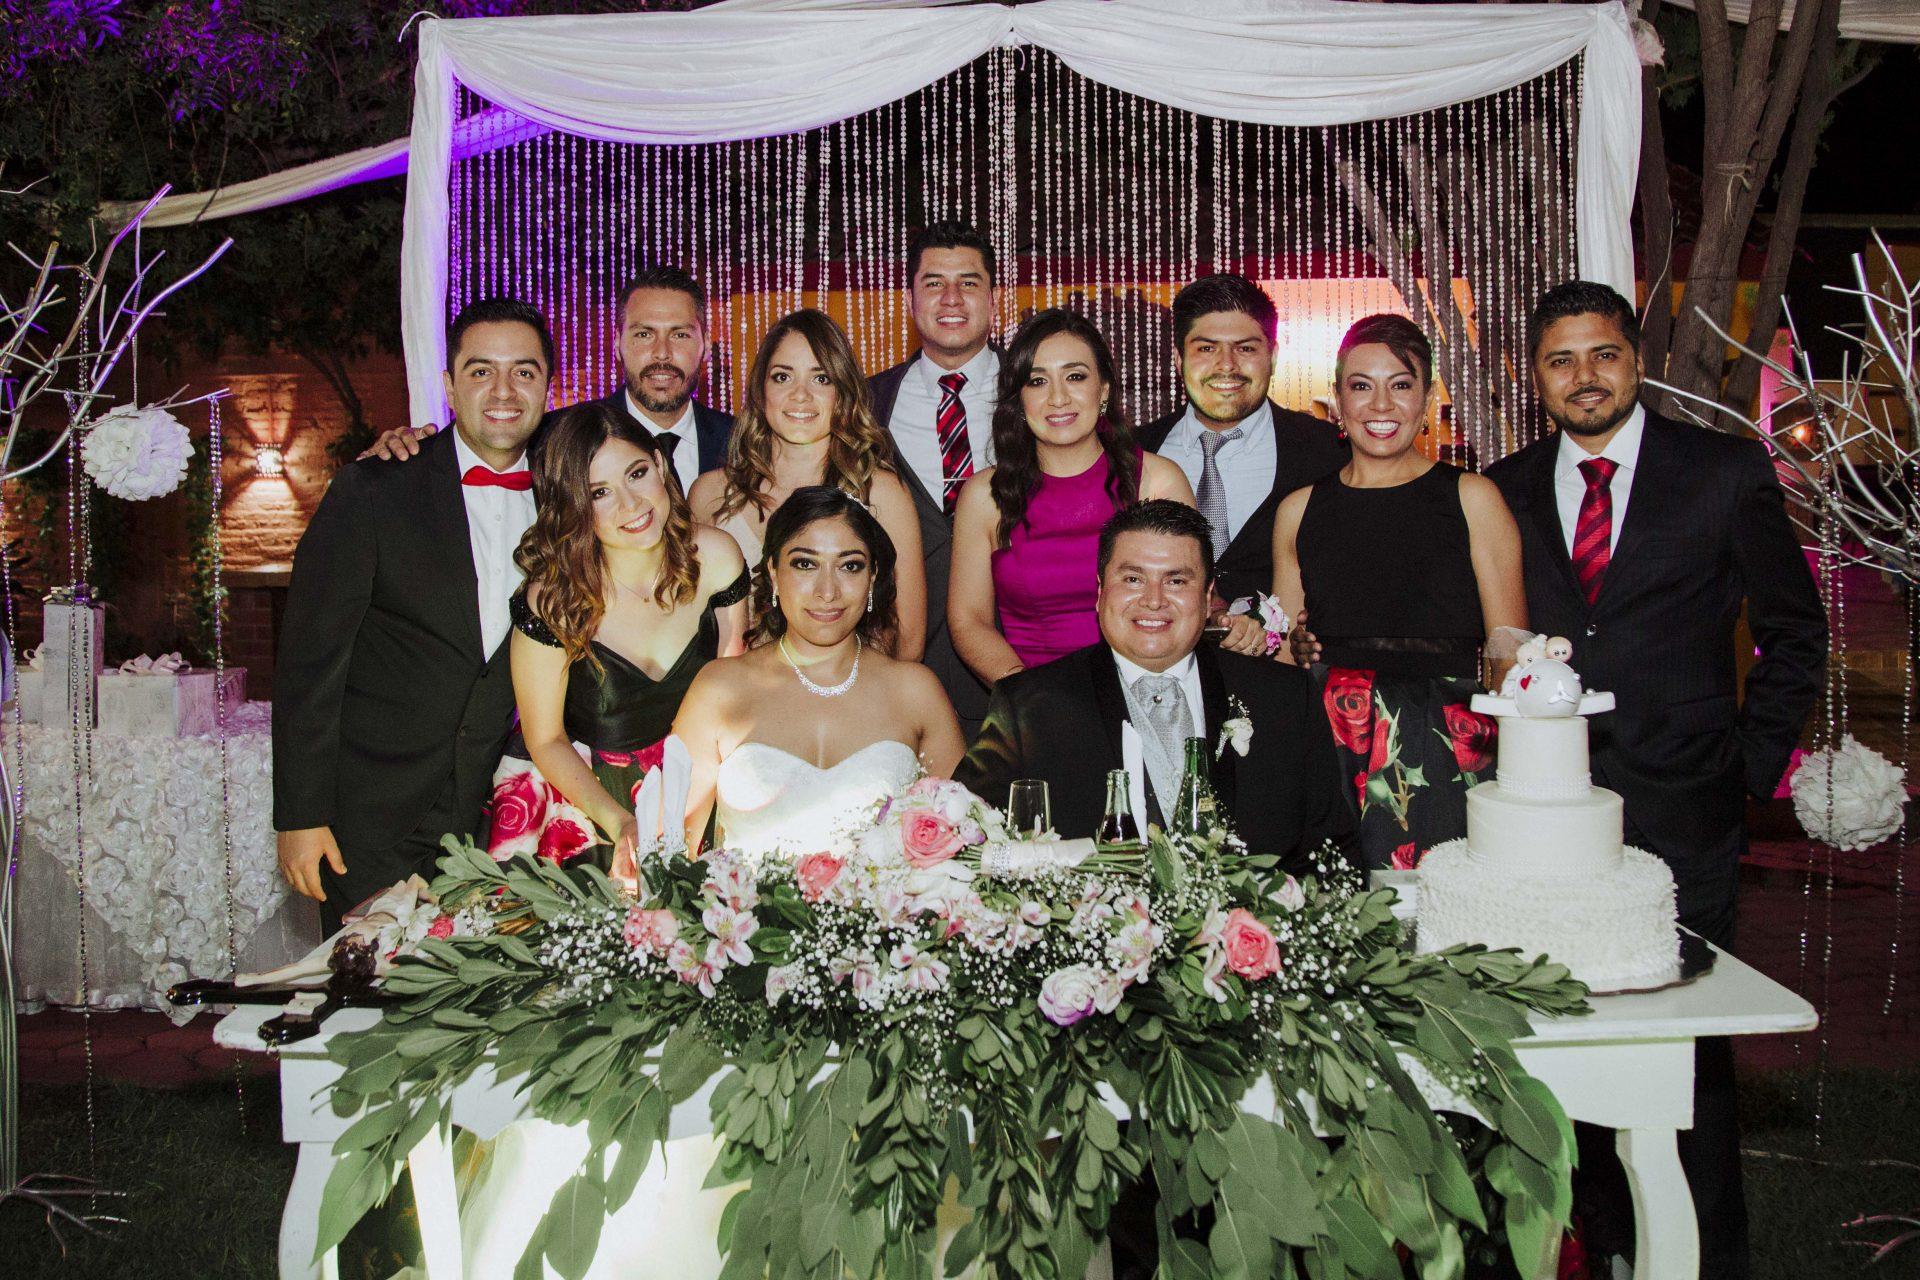 fotografo_profesional_zacatecas_chihuahua_bodas_xv_mexico-54